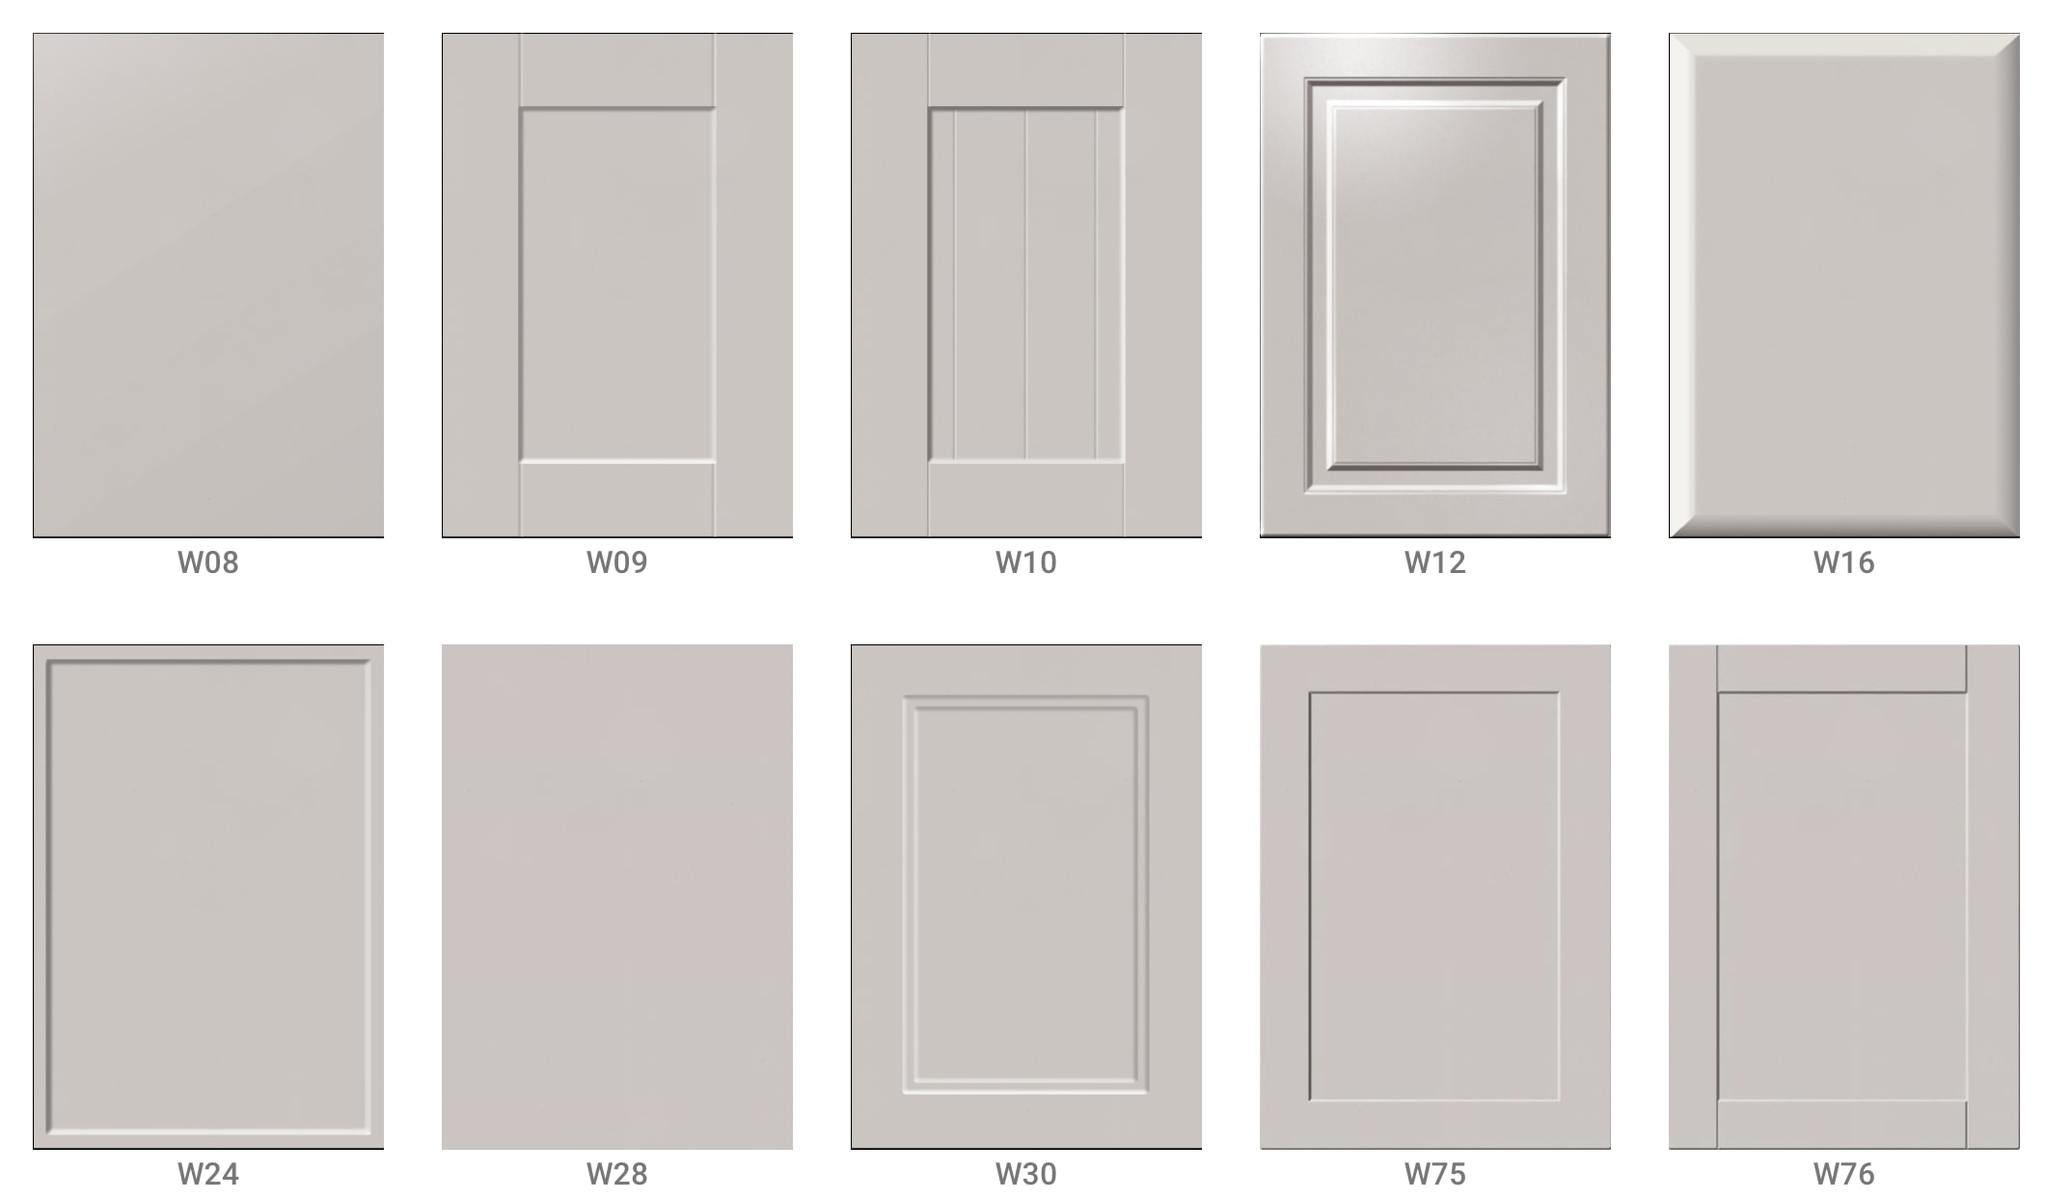 10 styles of kitchen doors for IKEA Faktum